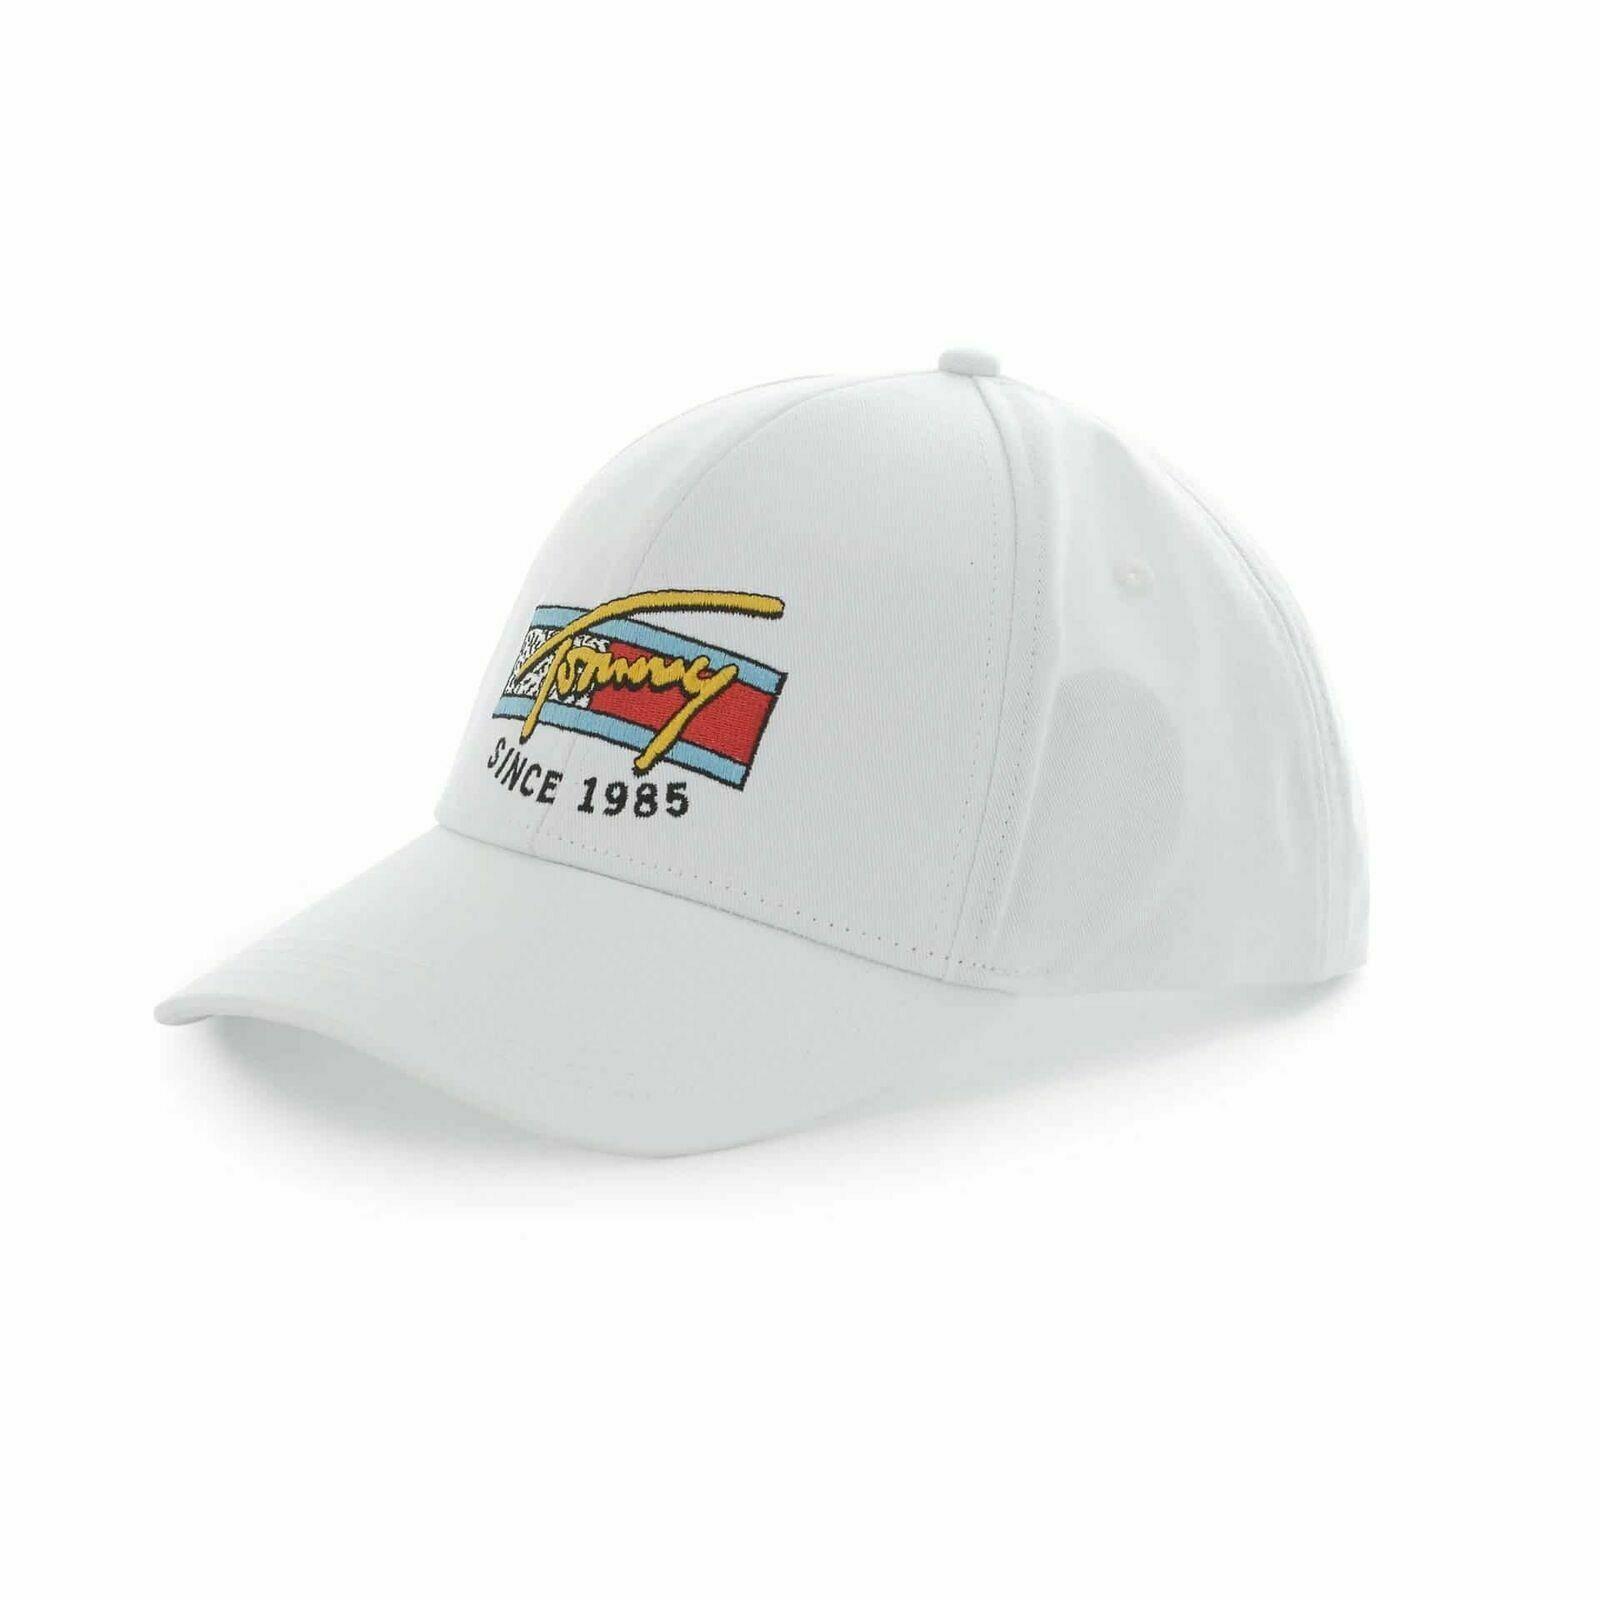 NWT Tommy Hilfiger 1985 Monogram White Hat Snapback One Size